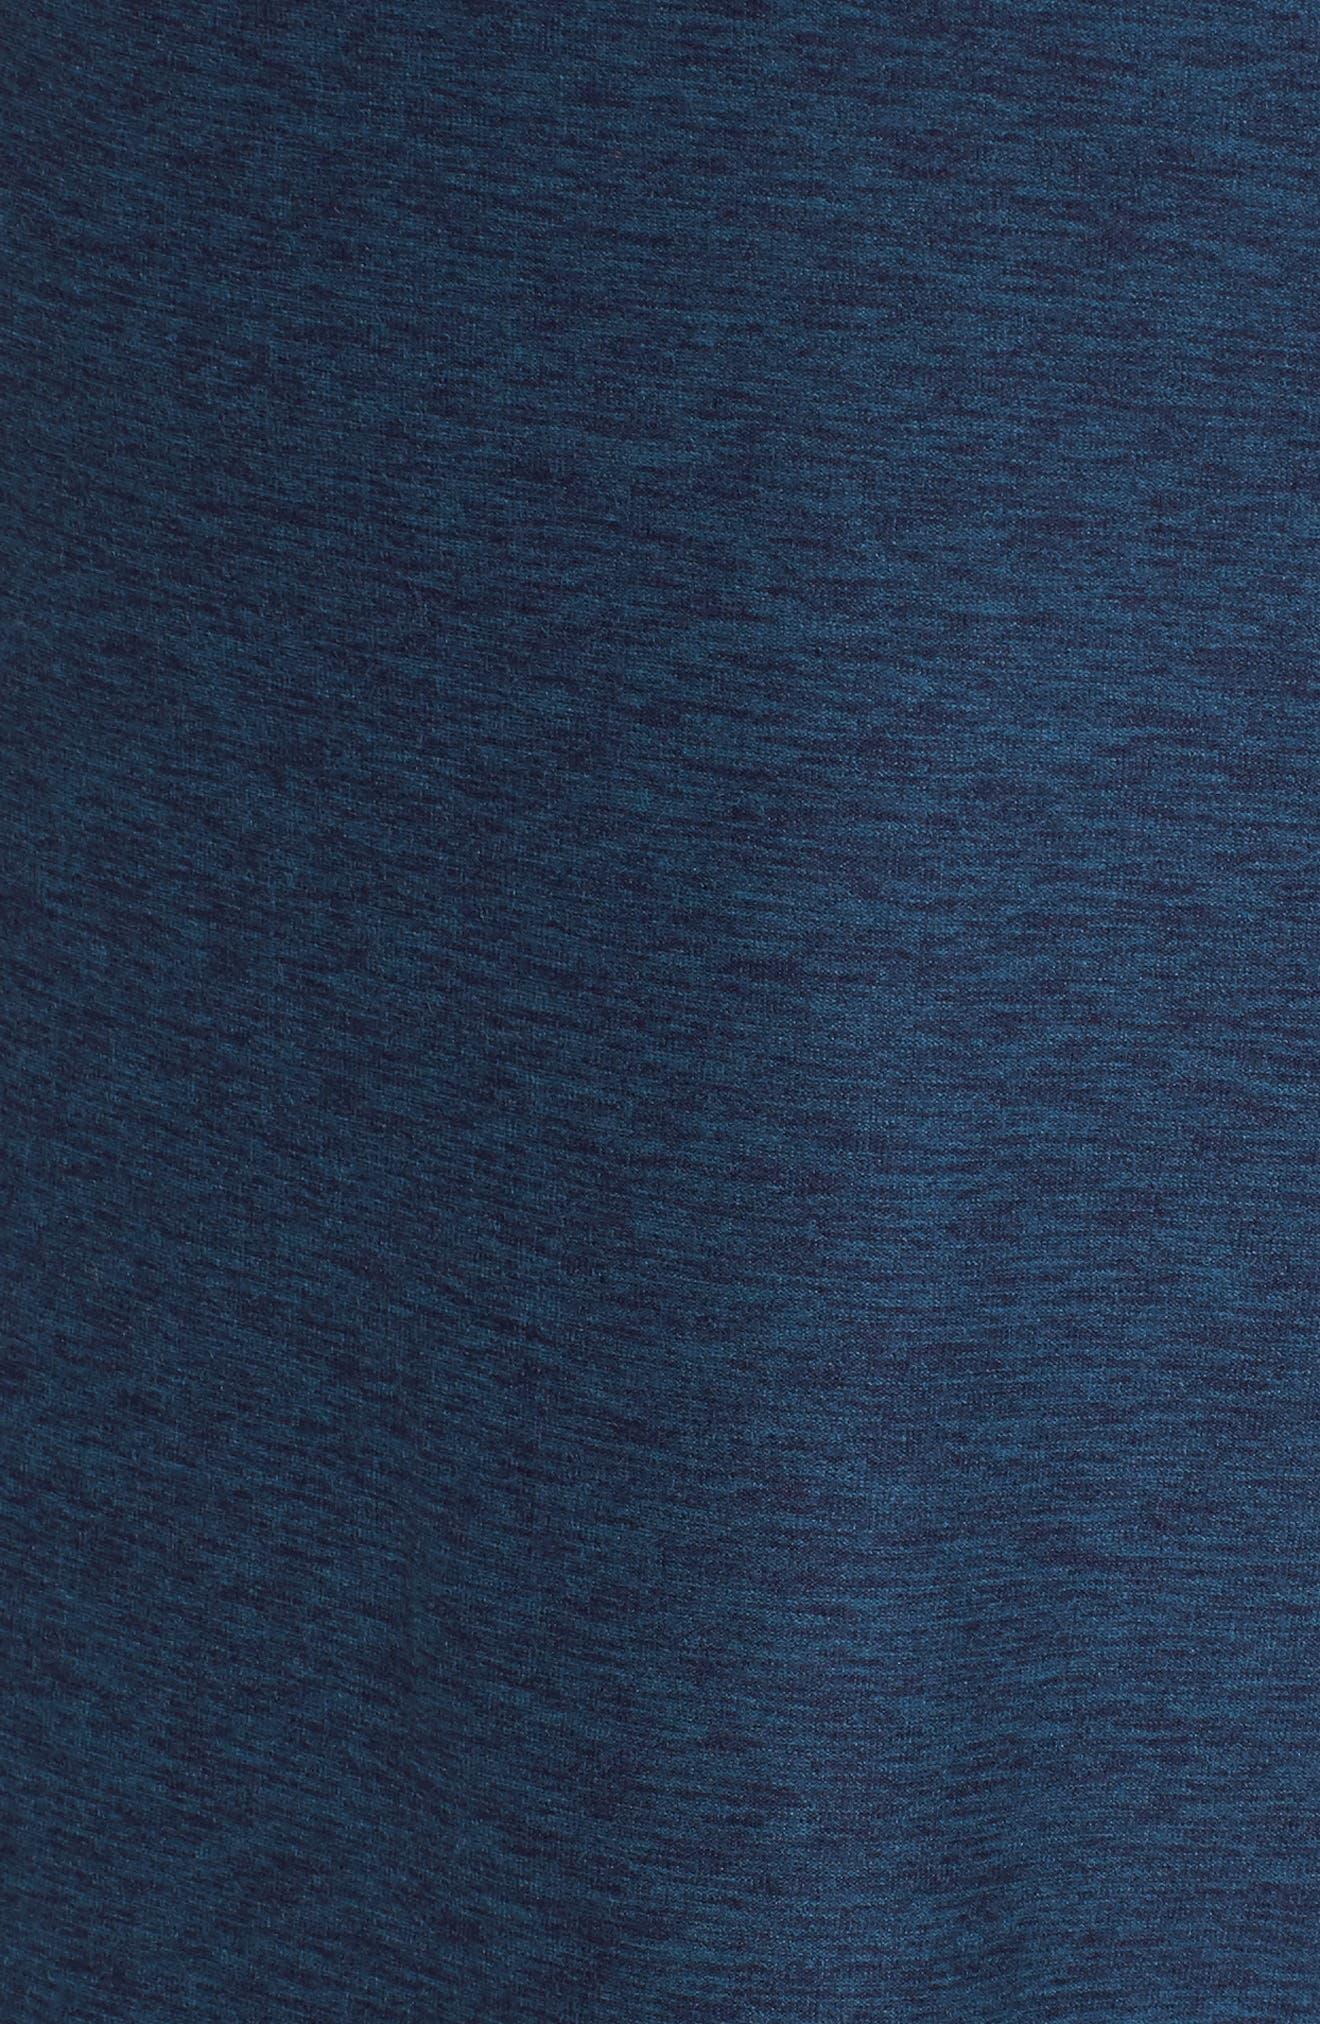 Anticipate Shorts,                             Alternate thumbnail 5, color,                             Pigment